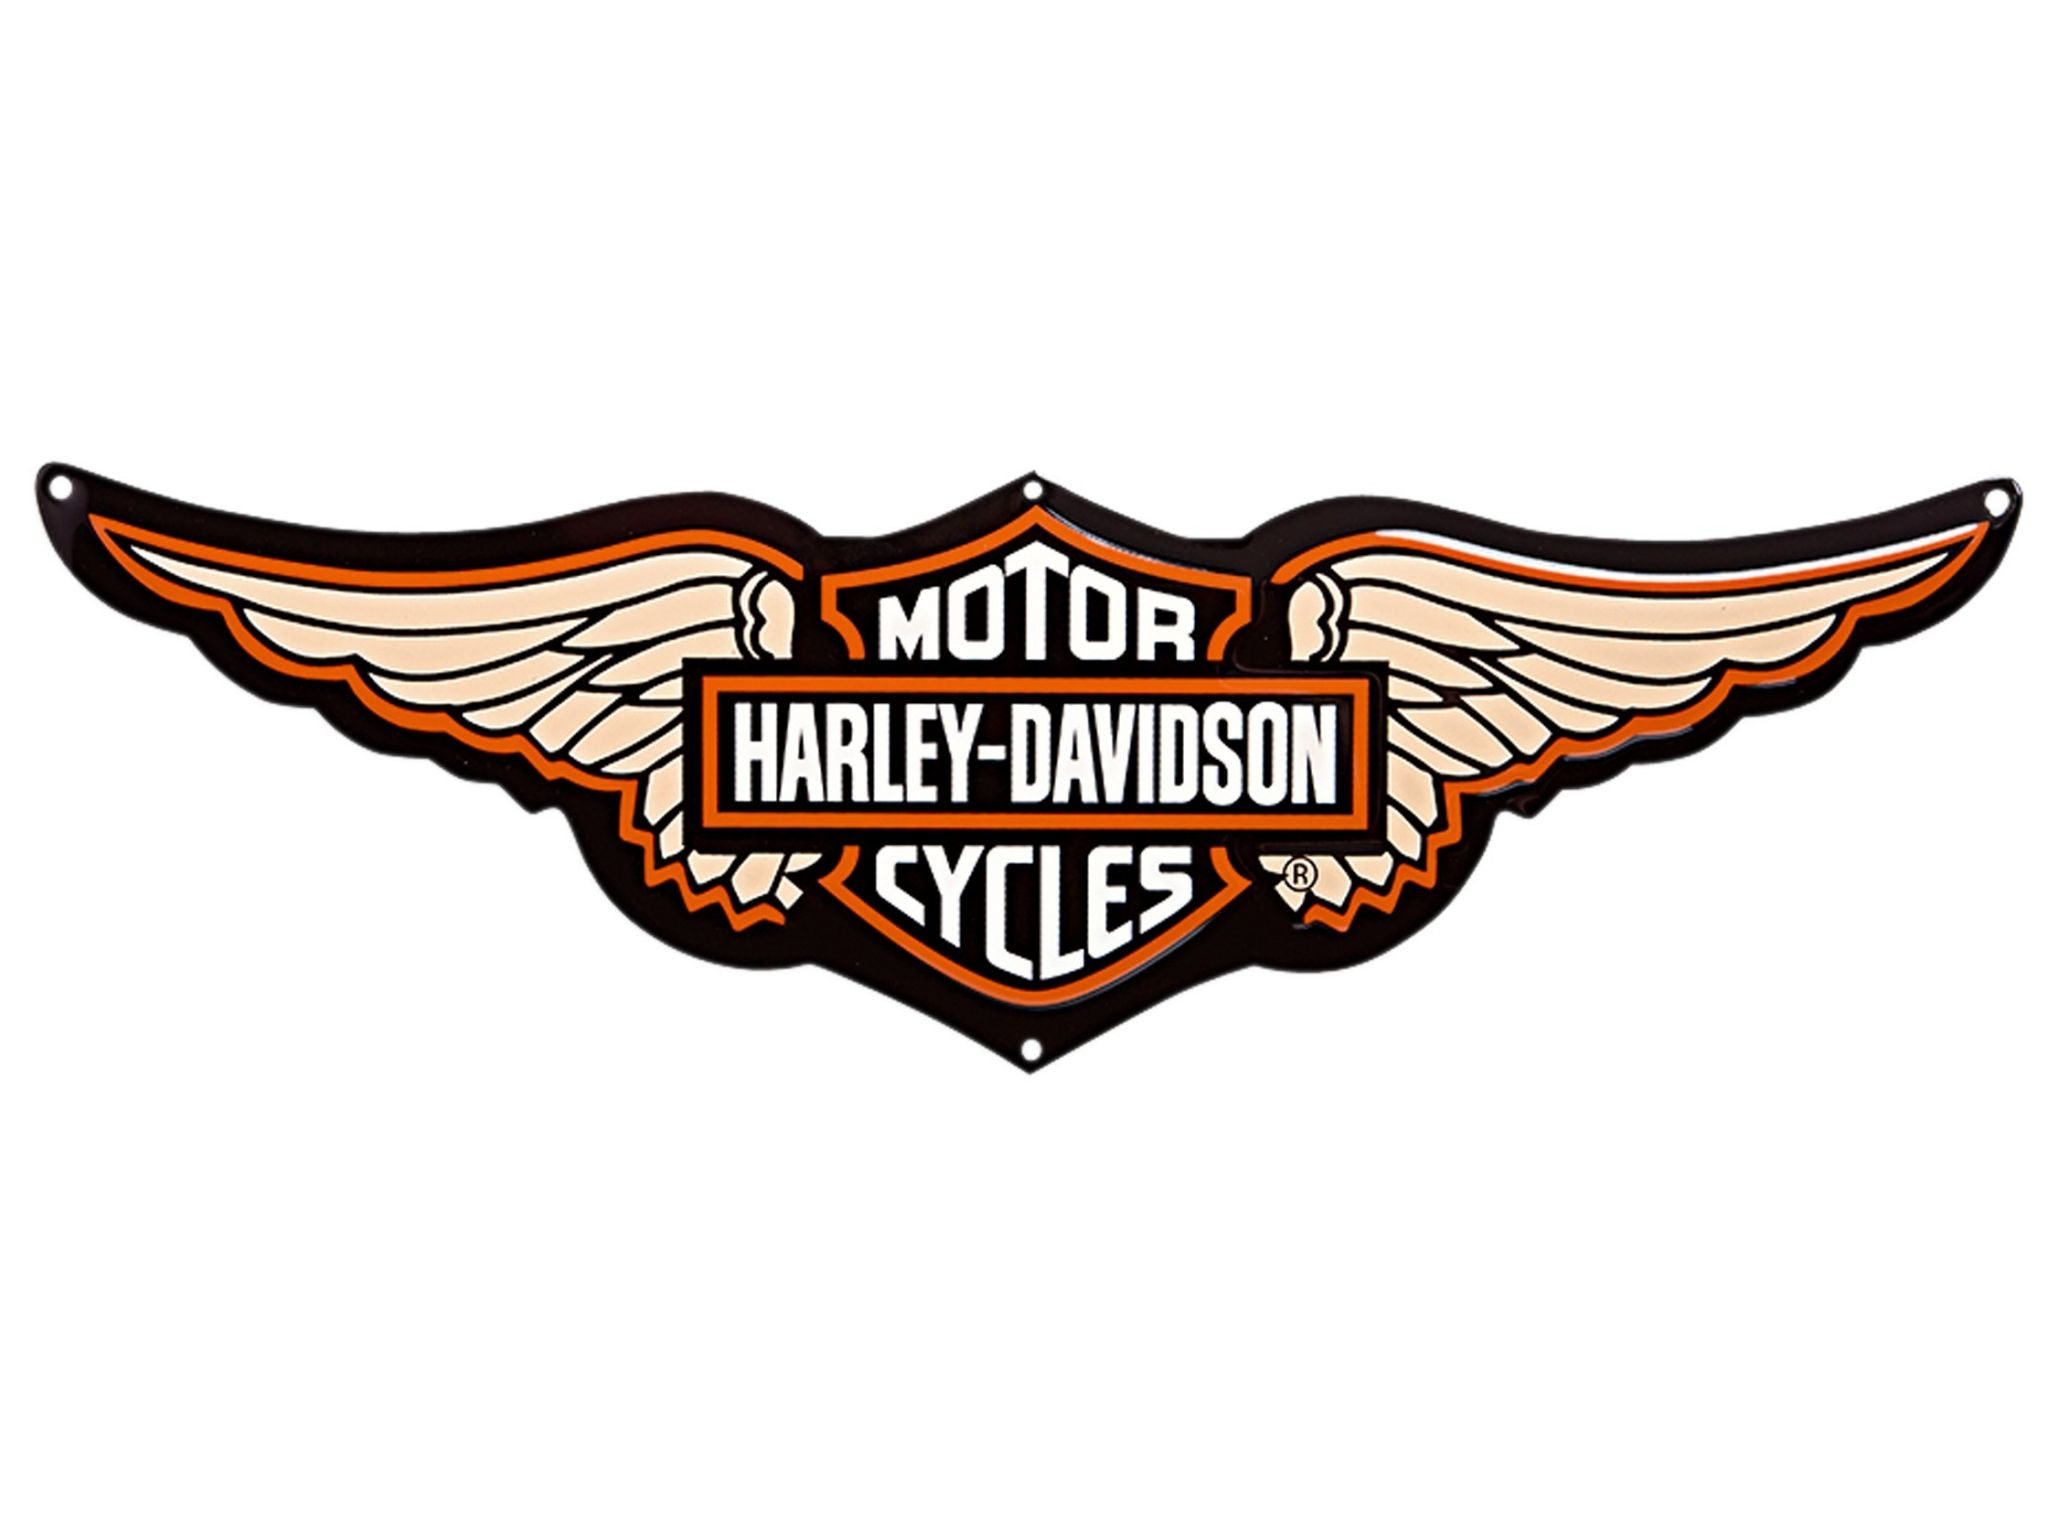 Harley Davidson Ipad Wallpaper Retina Sharovarka Pinterest